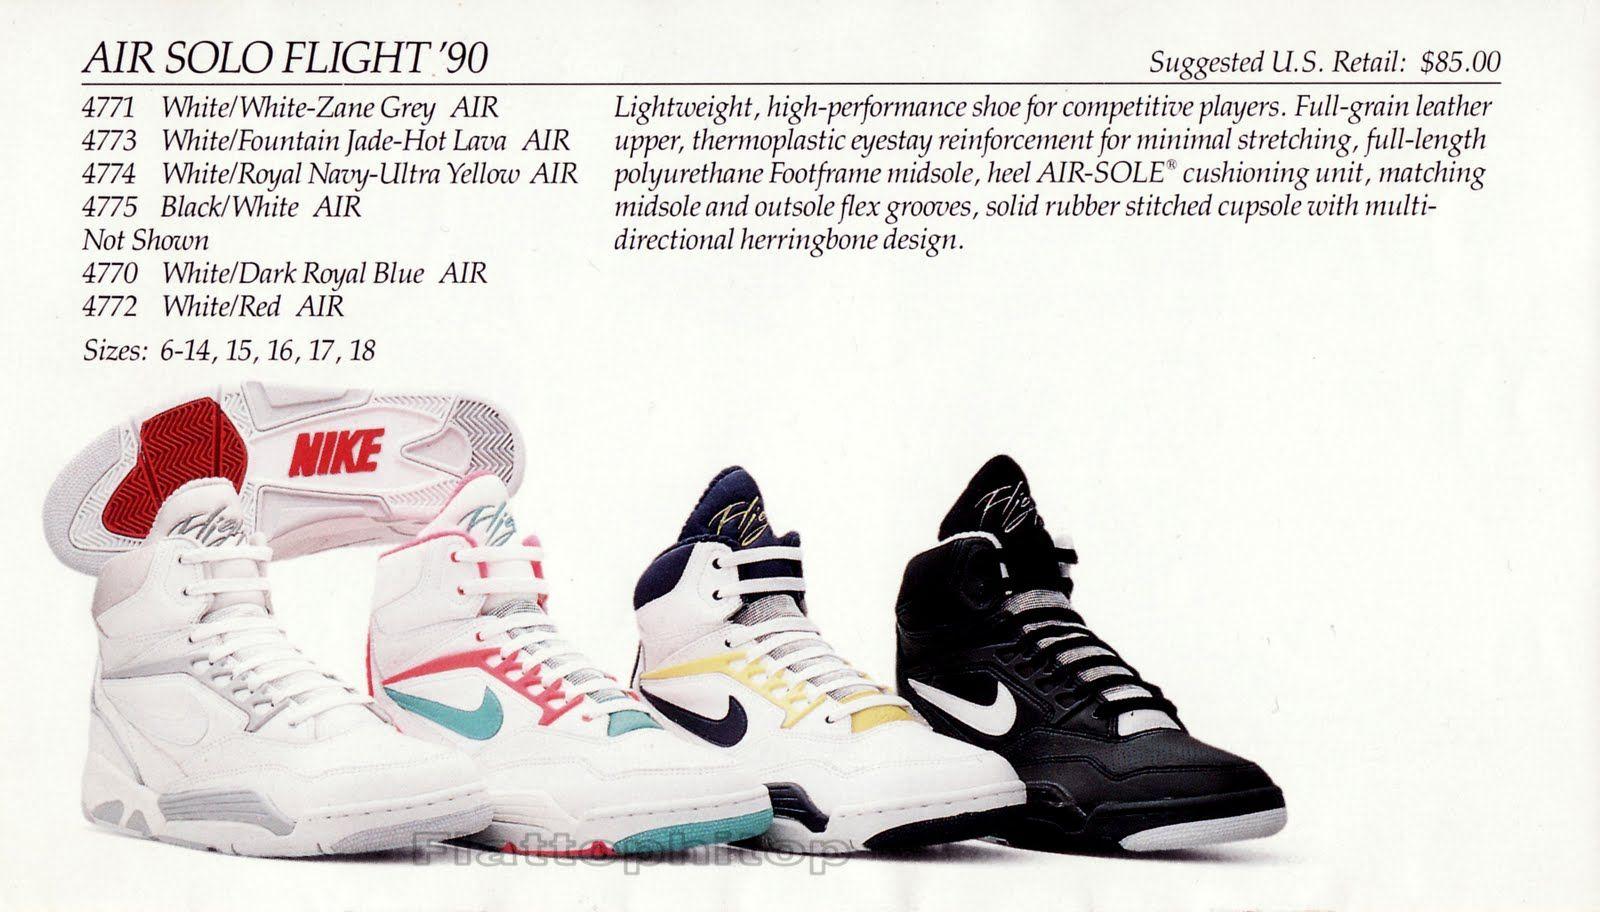 Derek Redmond Barcelona '92 - Nike Huarache | Just Do It Vintage |  Pinterest | Nike huarache